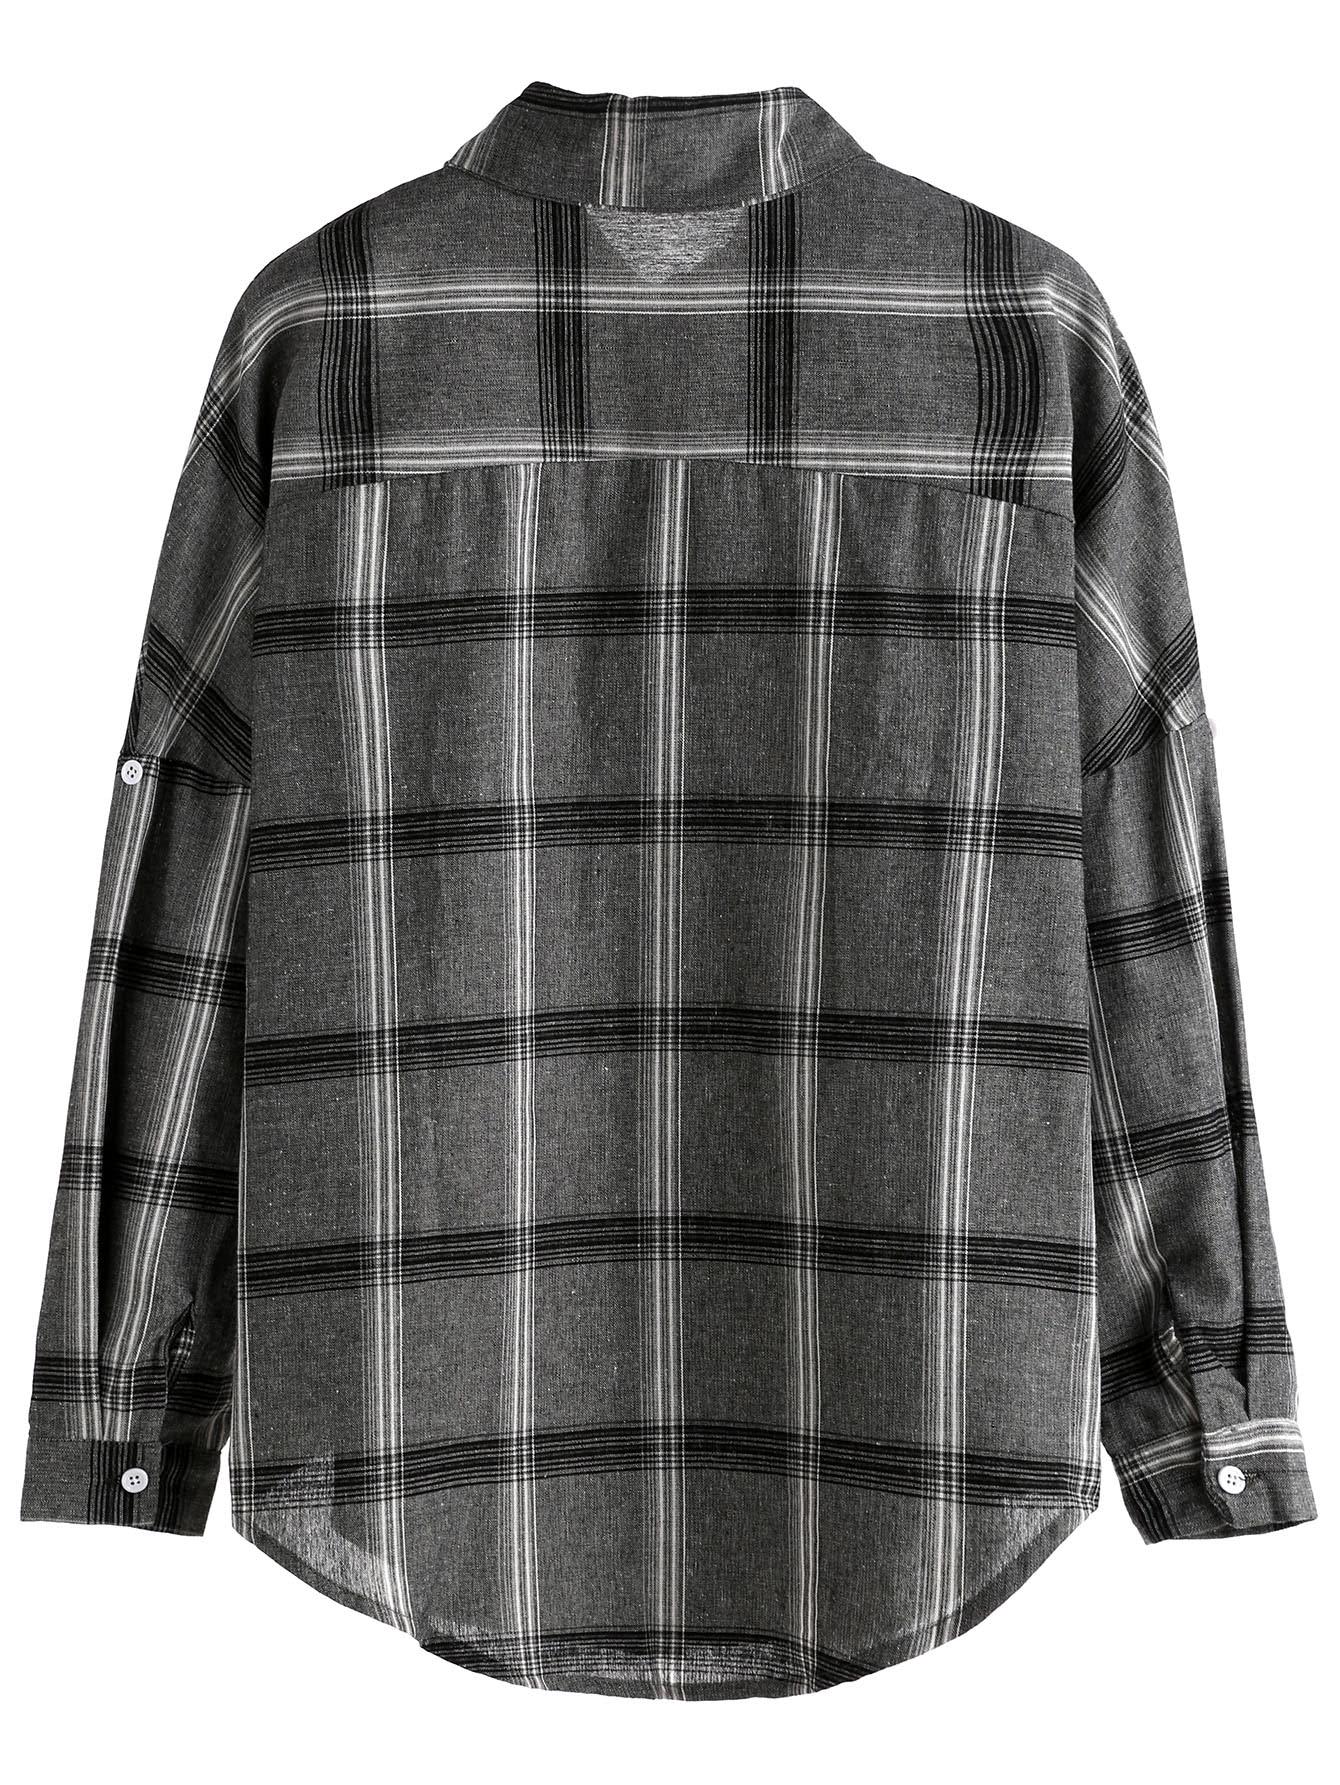 blouse160906126_2